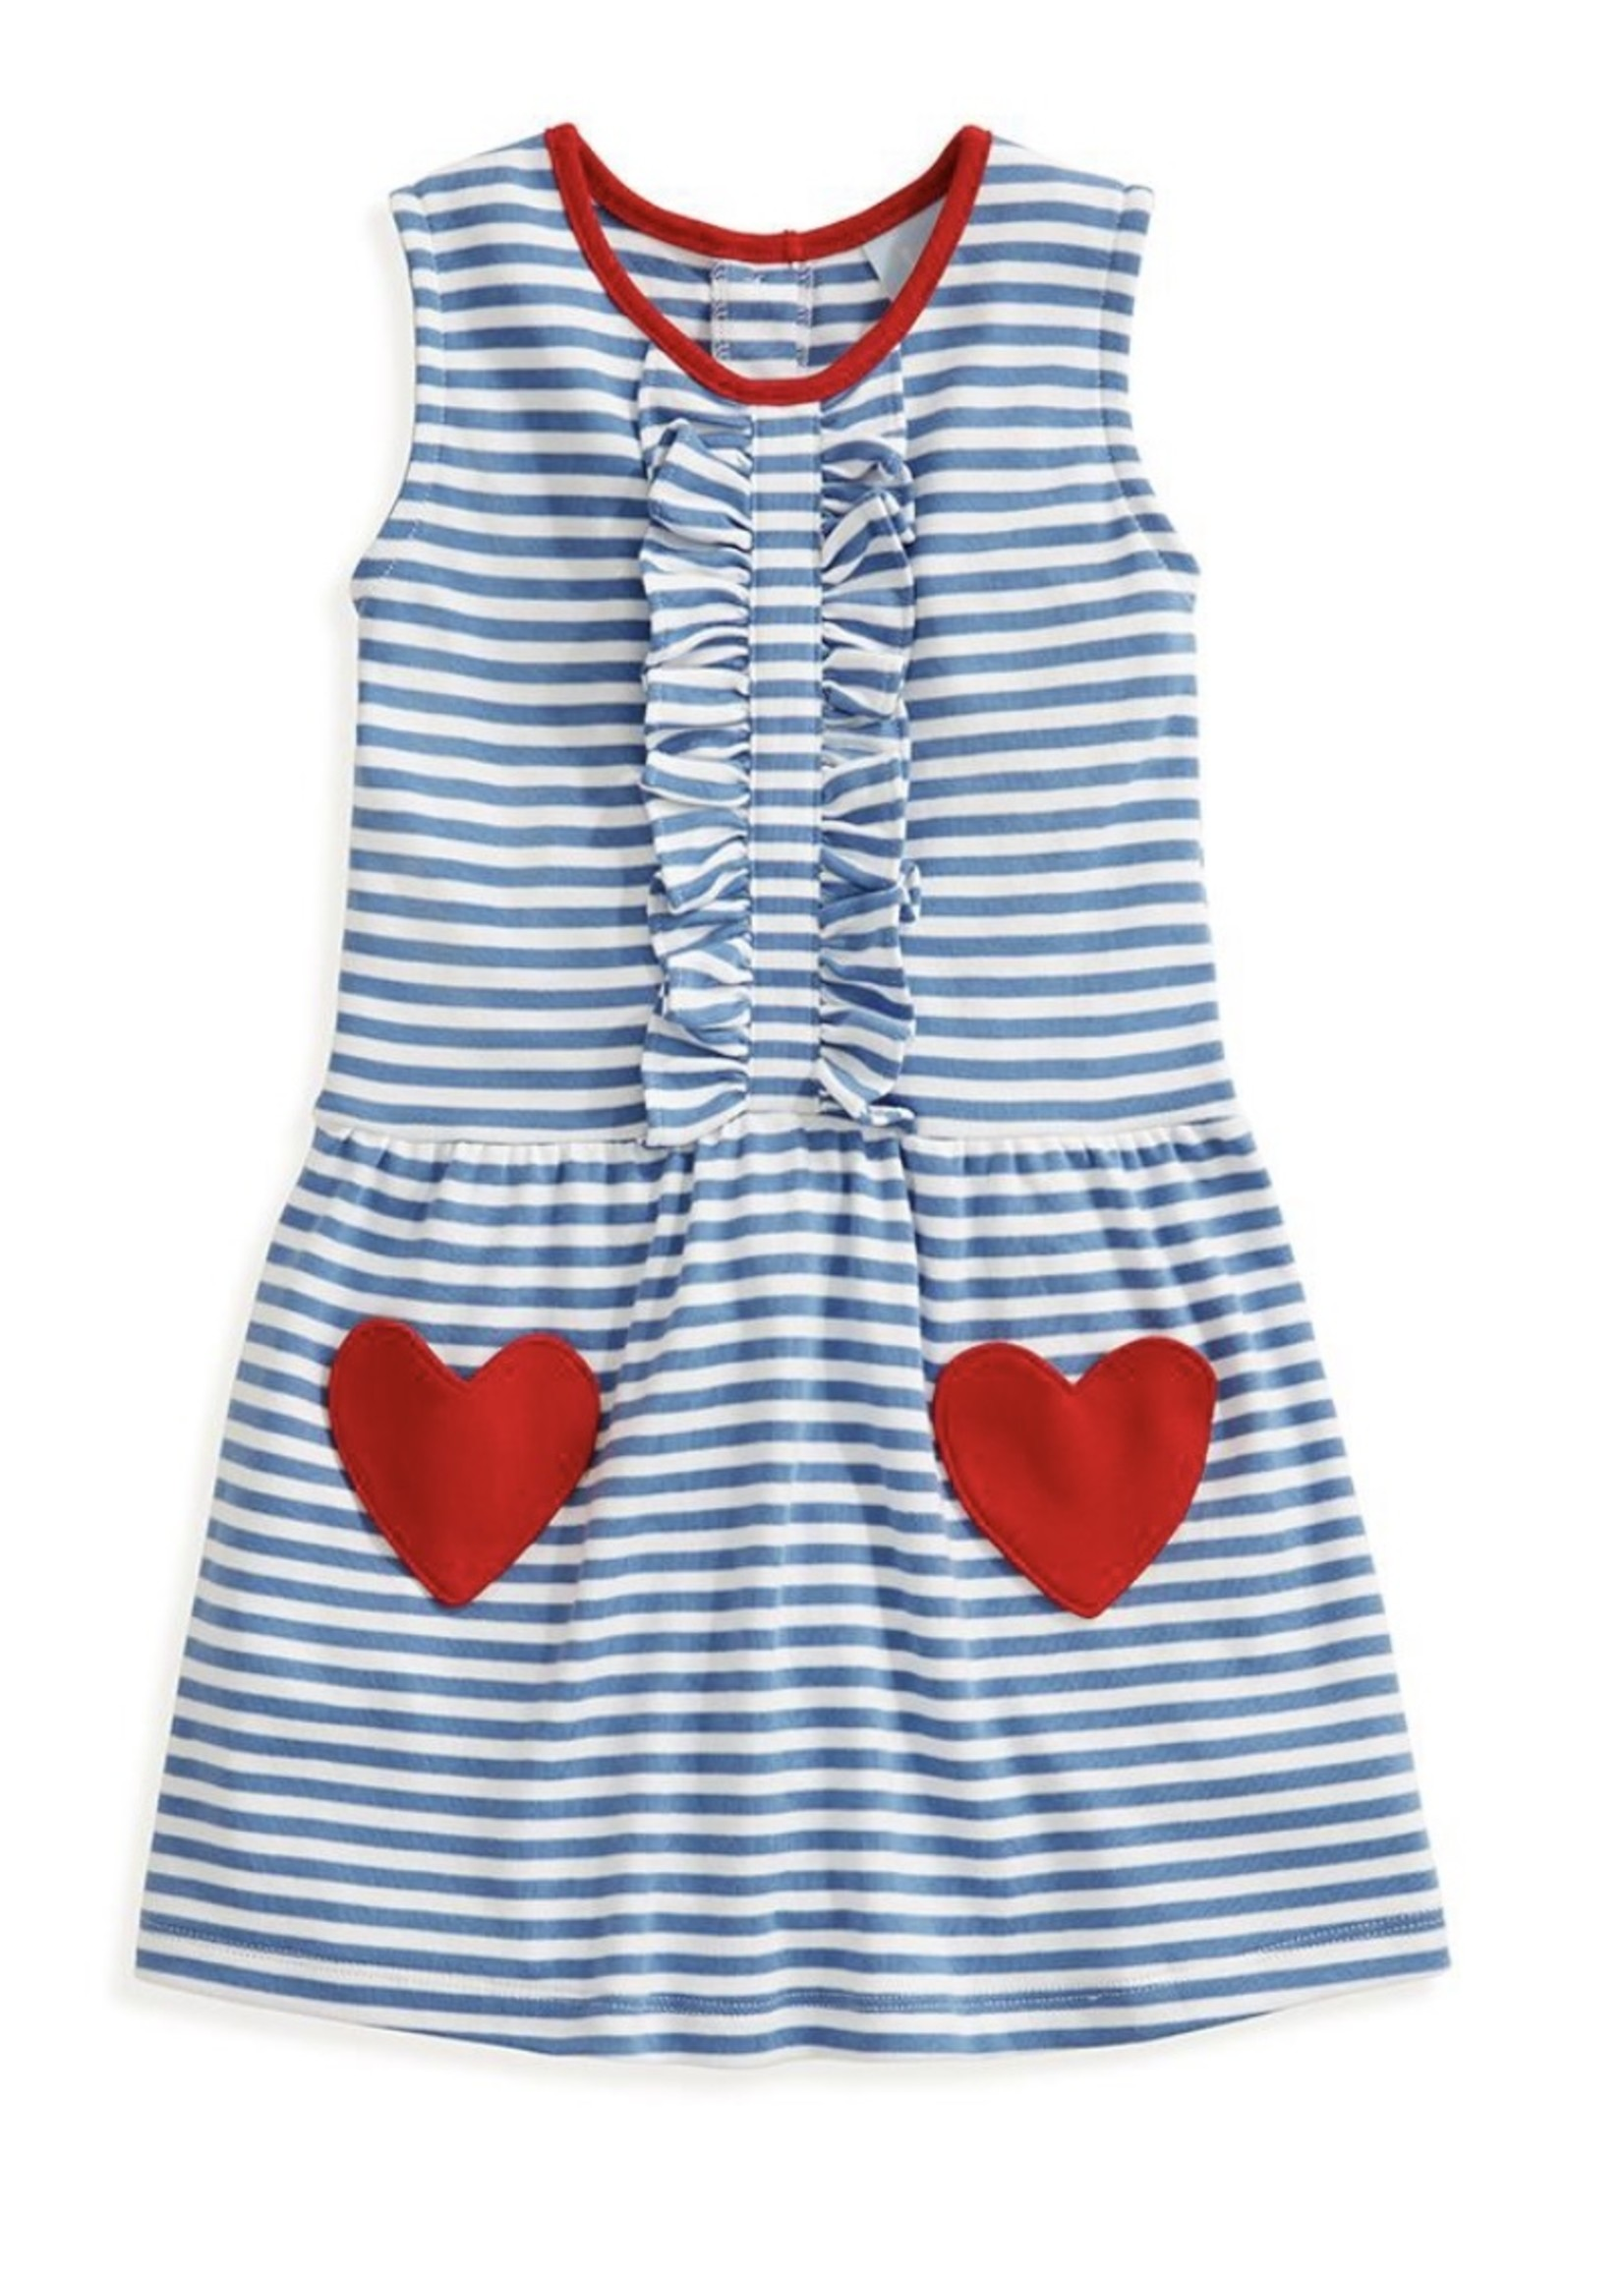 ROYAL/ WHITE STRIPE HEART POCKET PIMA DRESS